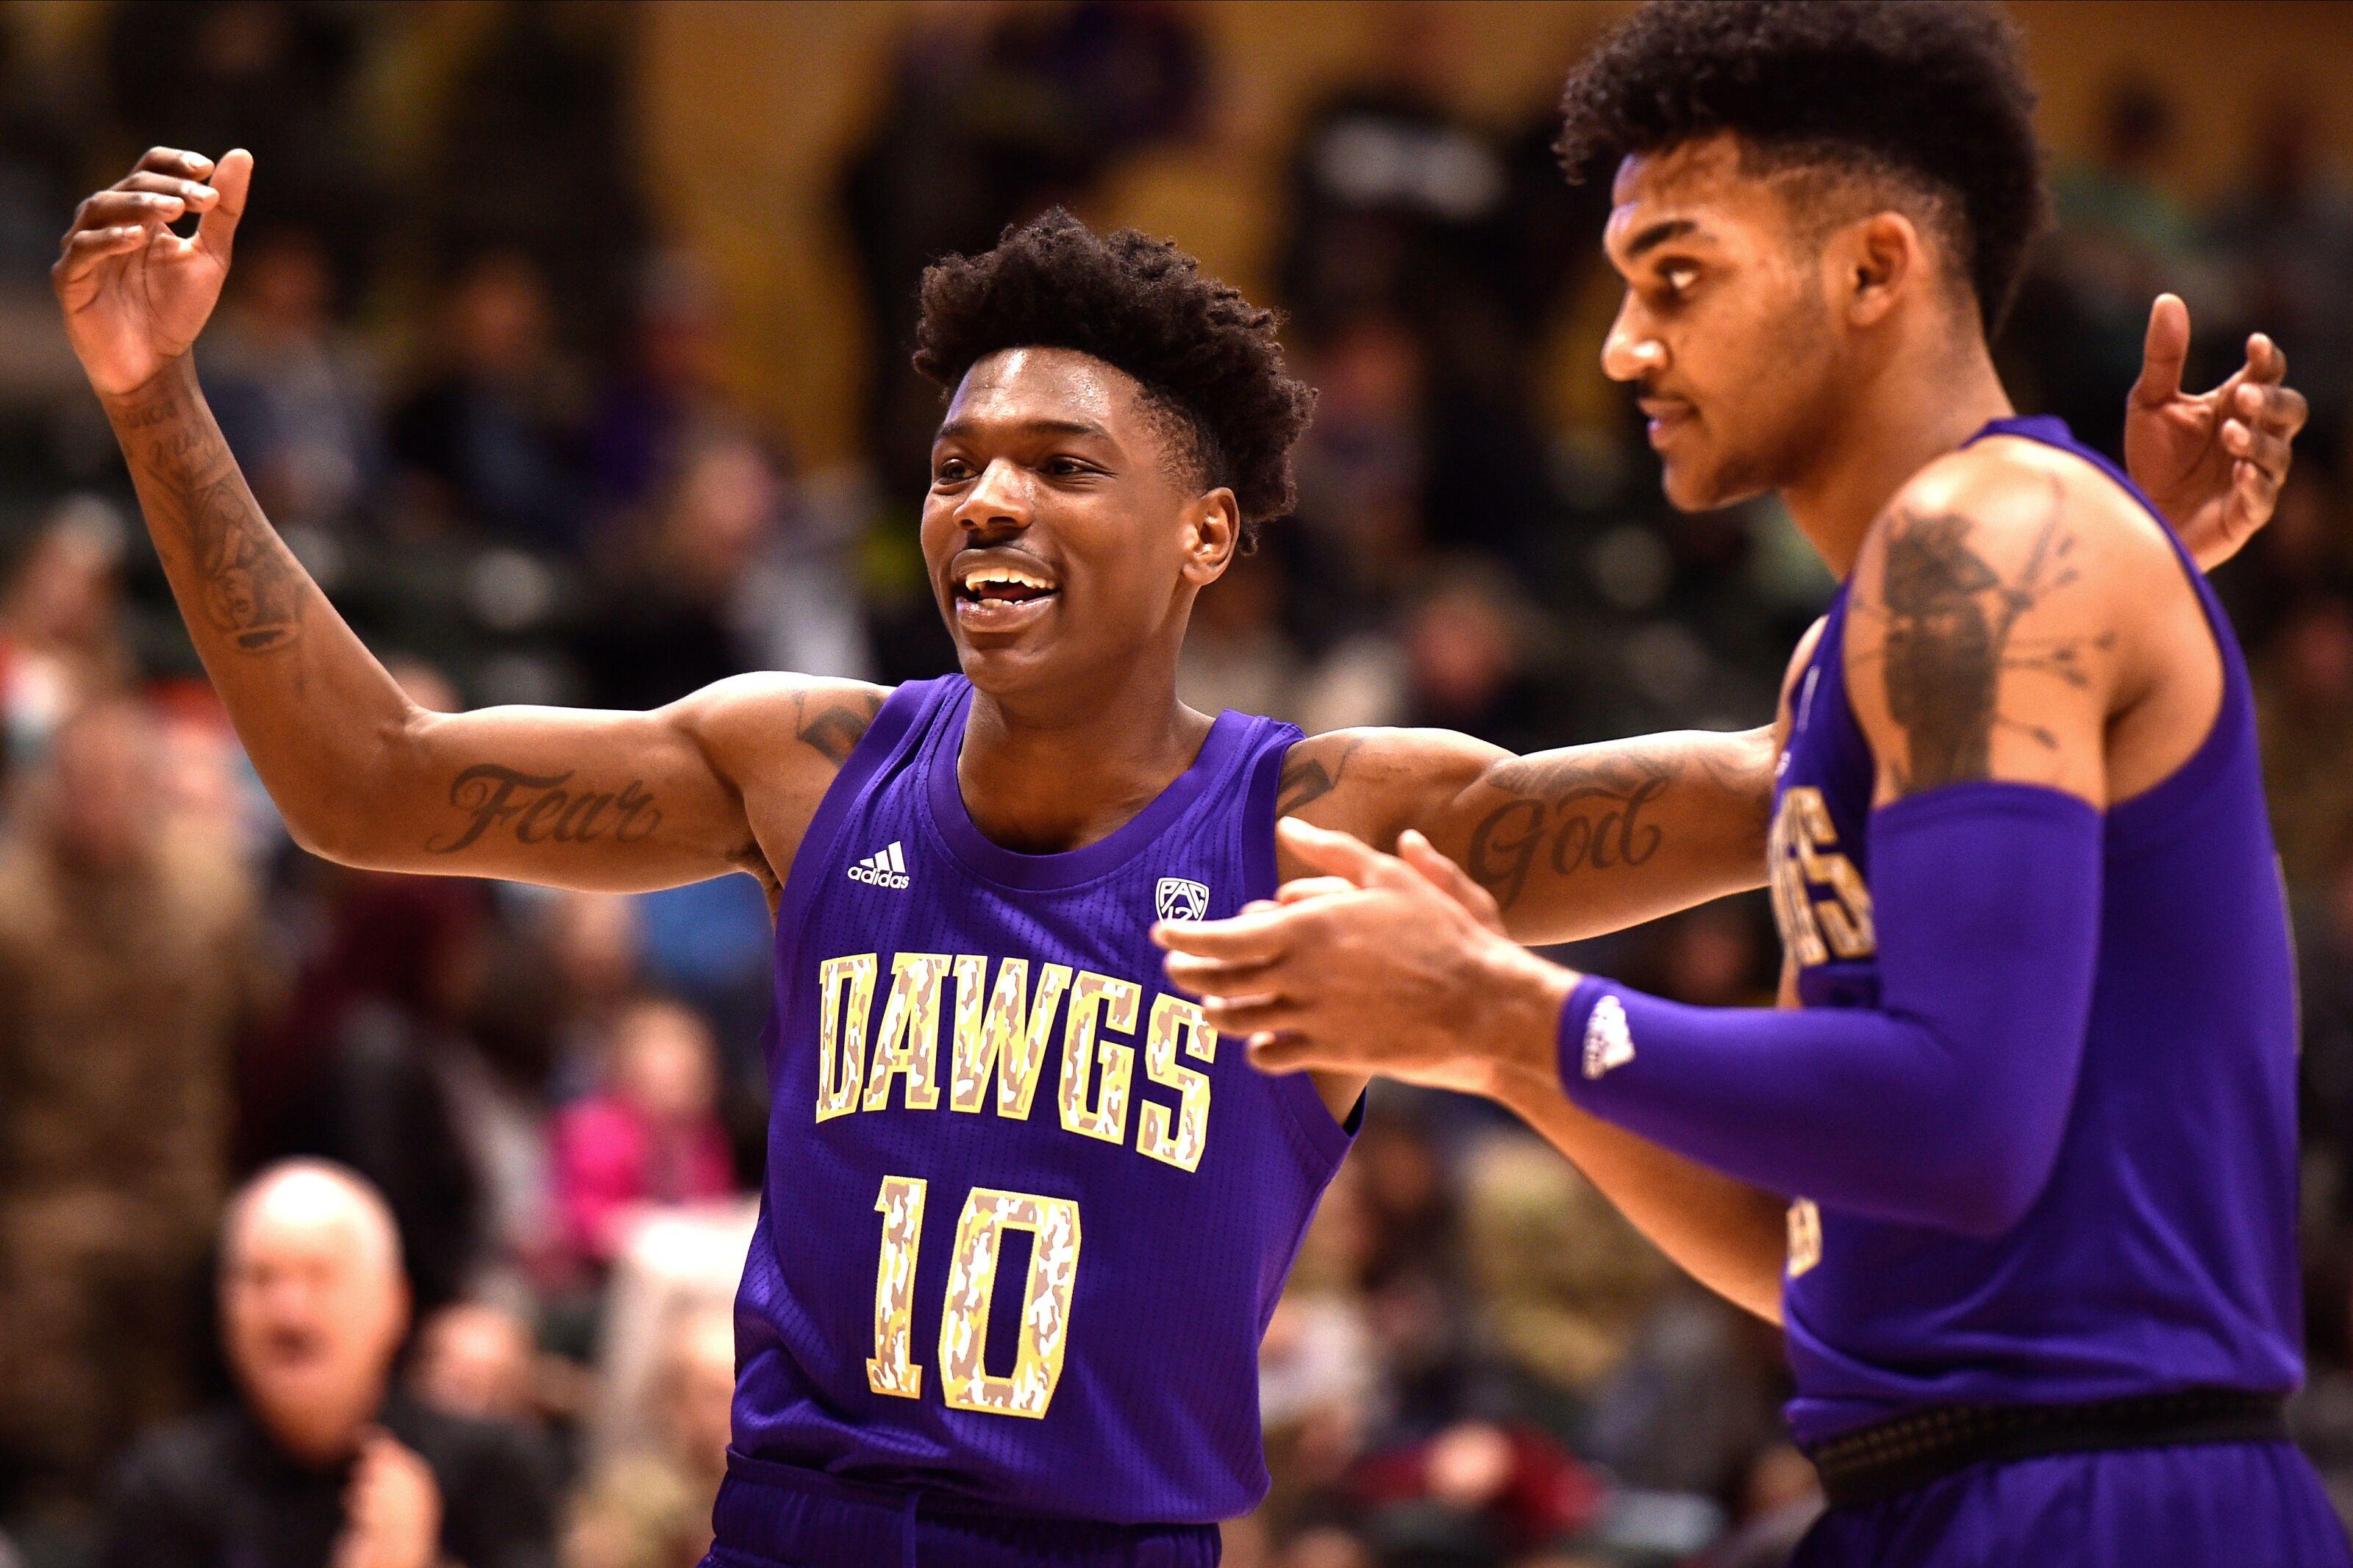 Washington basketball ends losing streak against Oregon State